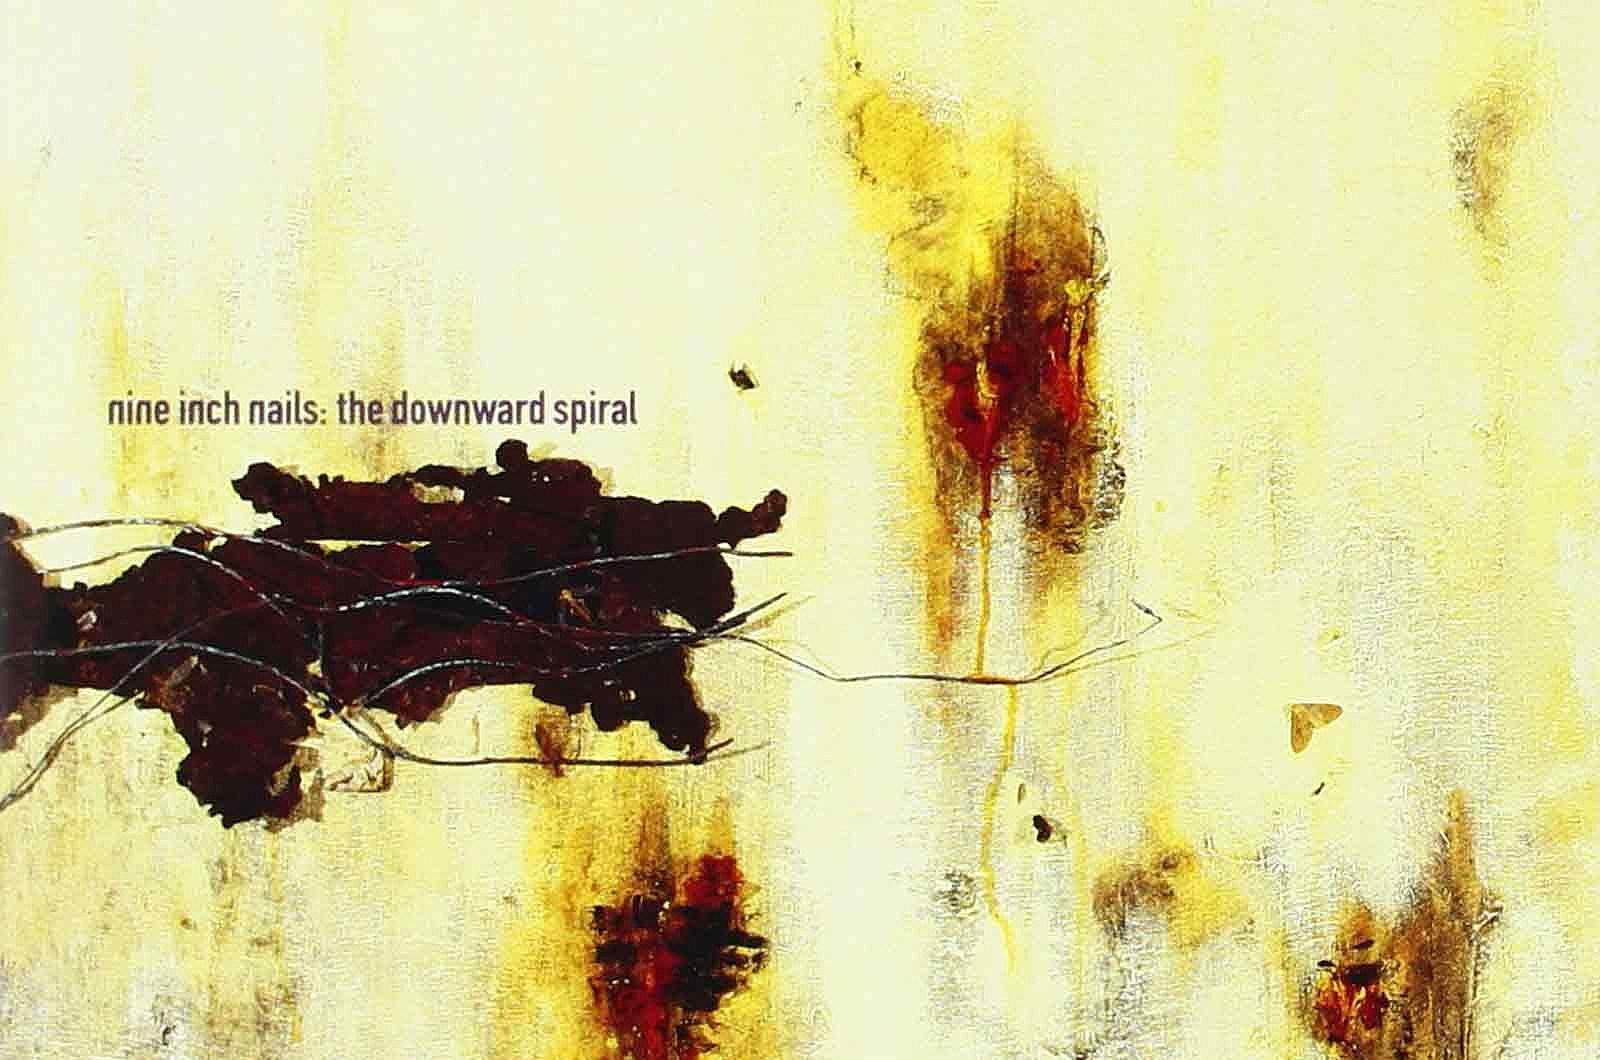 25 Years Ago: Nine Inch Nails Get Dark on 'The Downward Spiral'